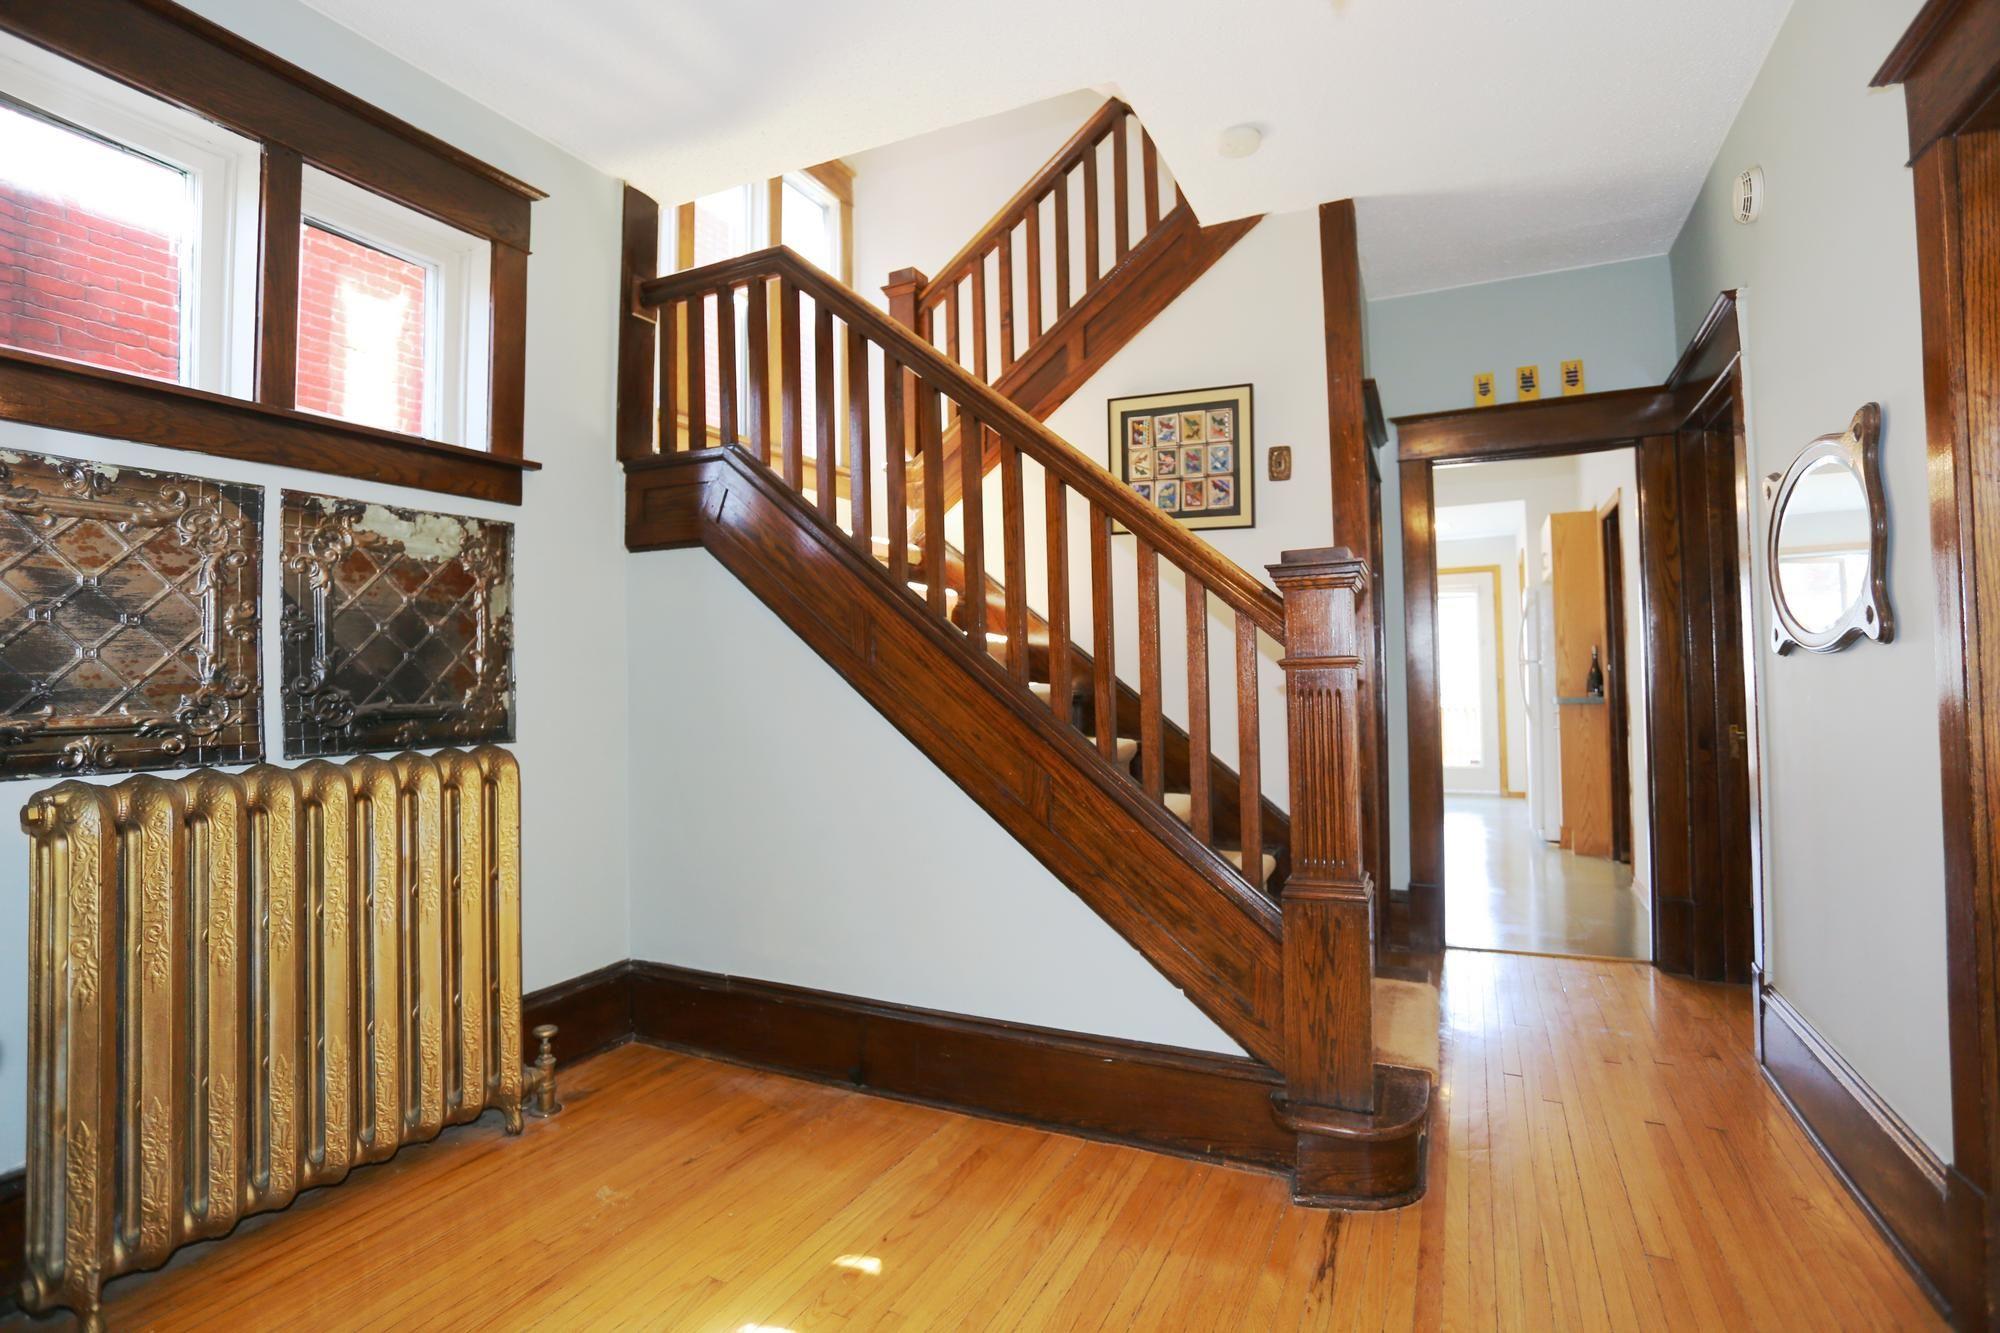 Photo 7: Photos: 96 Home Street in Winnipeg: Wolseley Single Family Detached for sale (5B)  : MLS®# 1810985